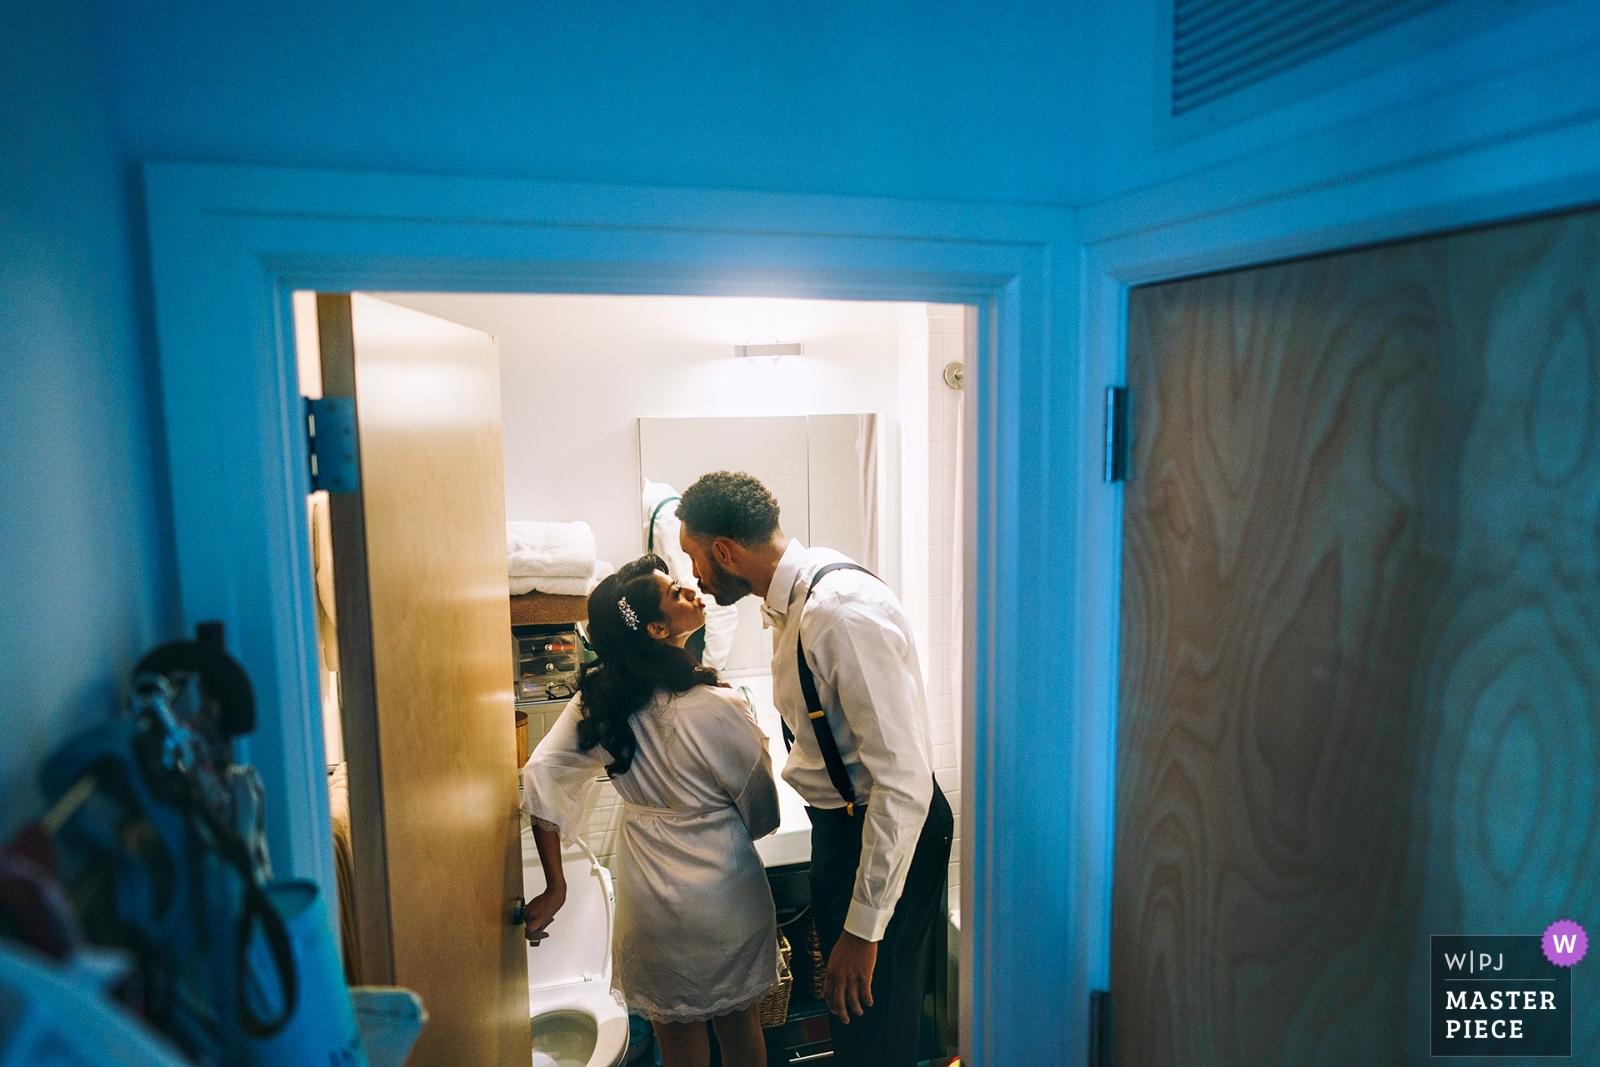 bride getting ready - Bronx, New York City - Metro Wedding Photography -  | Home